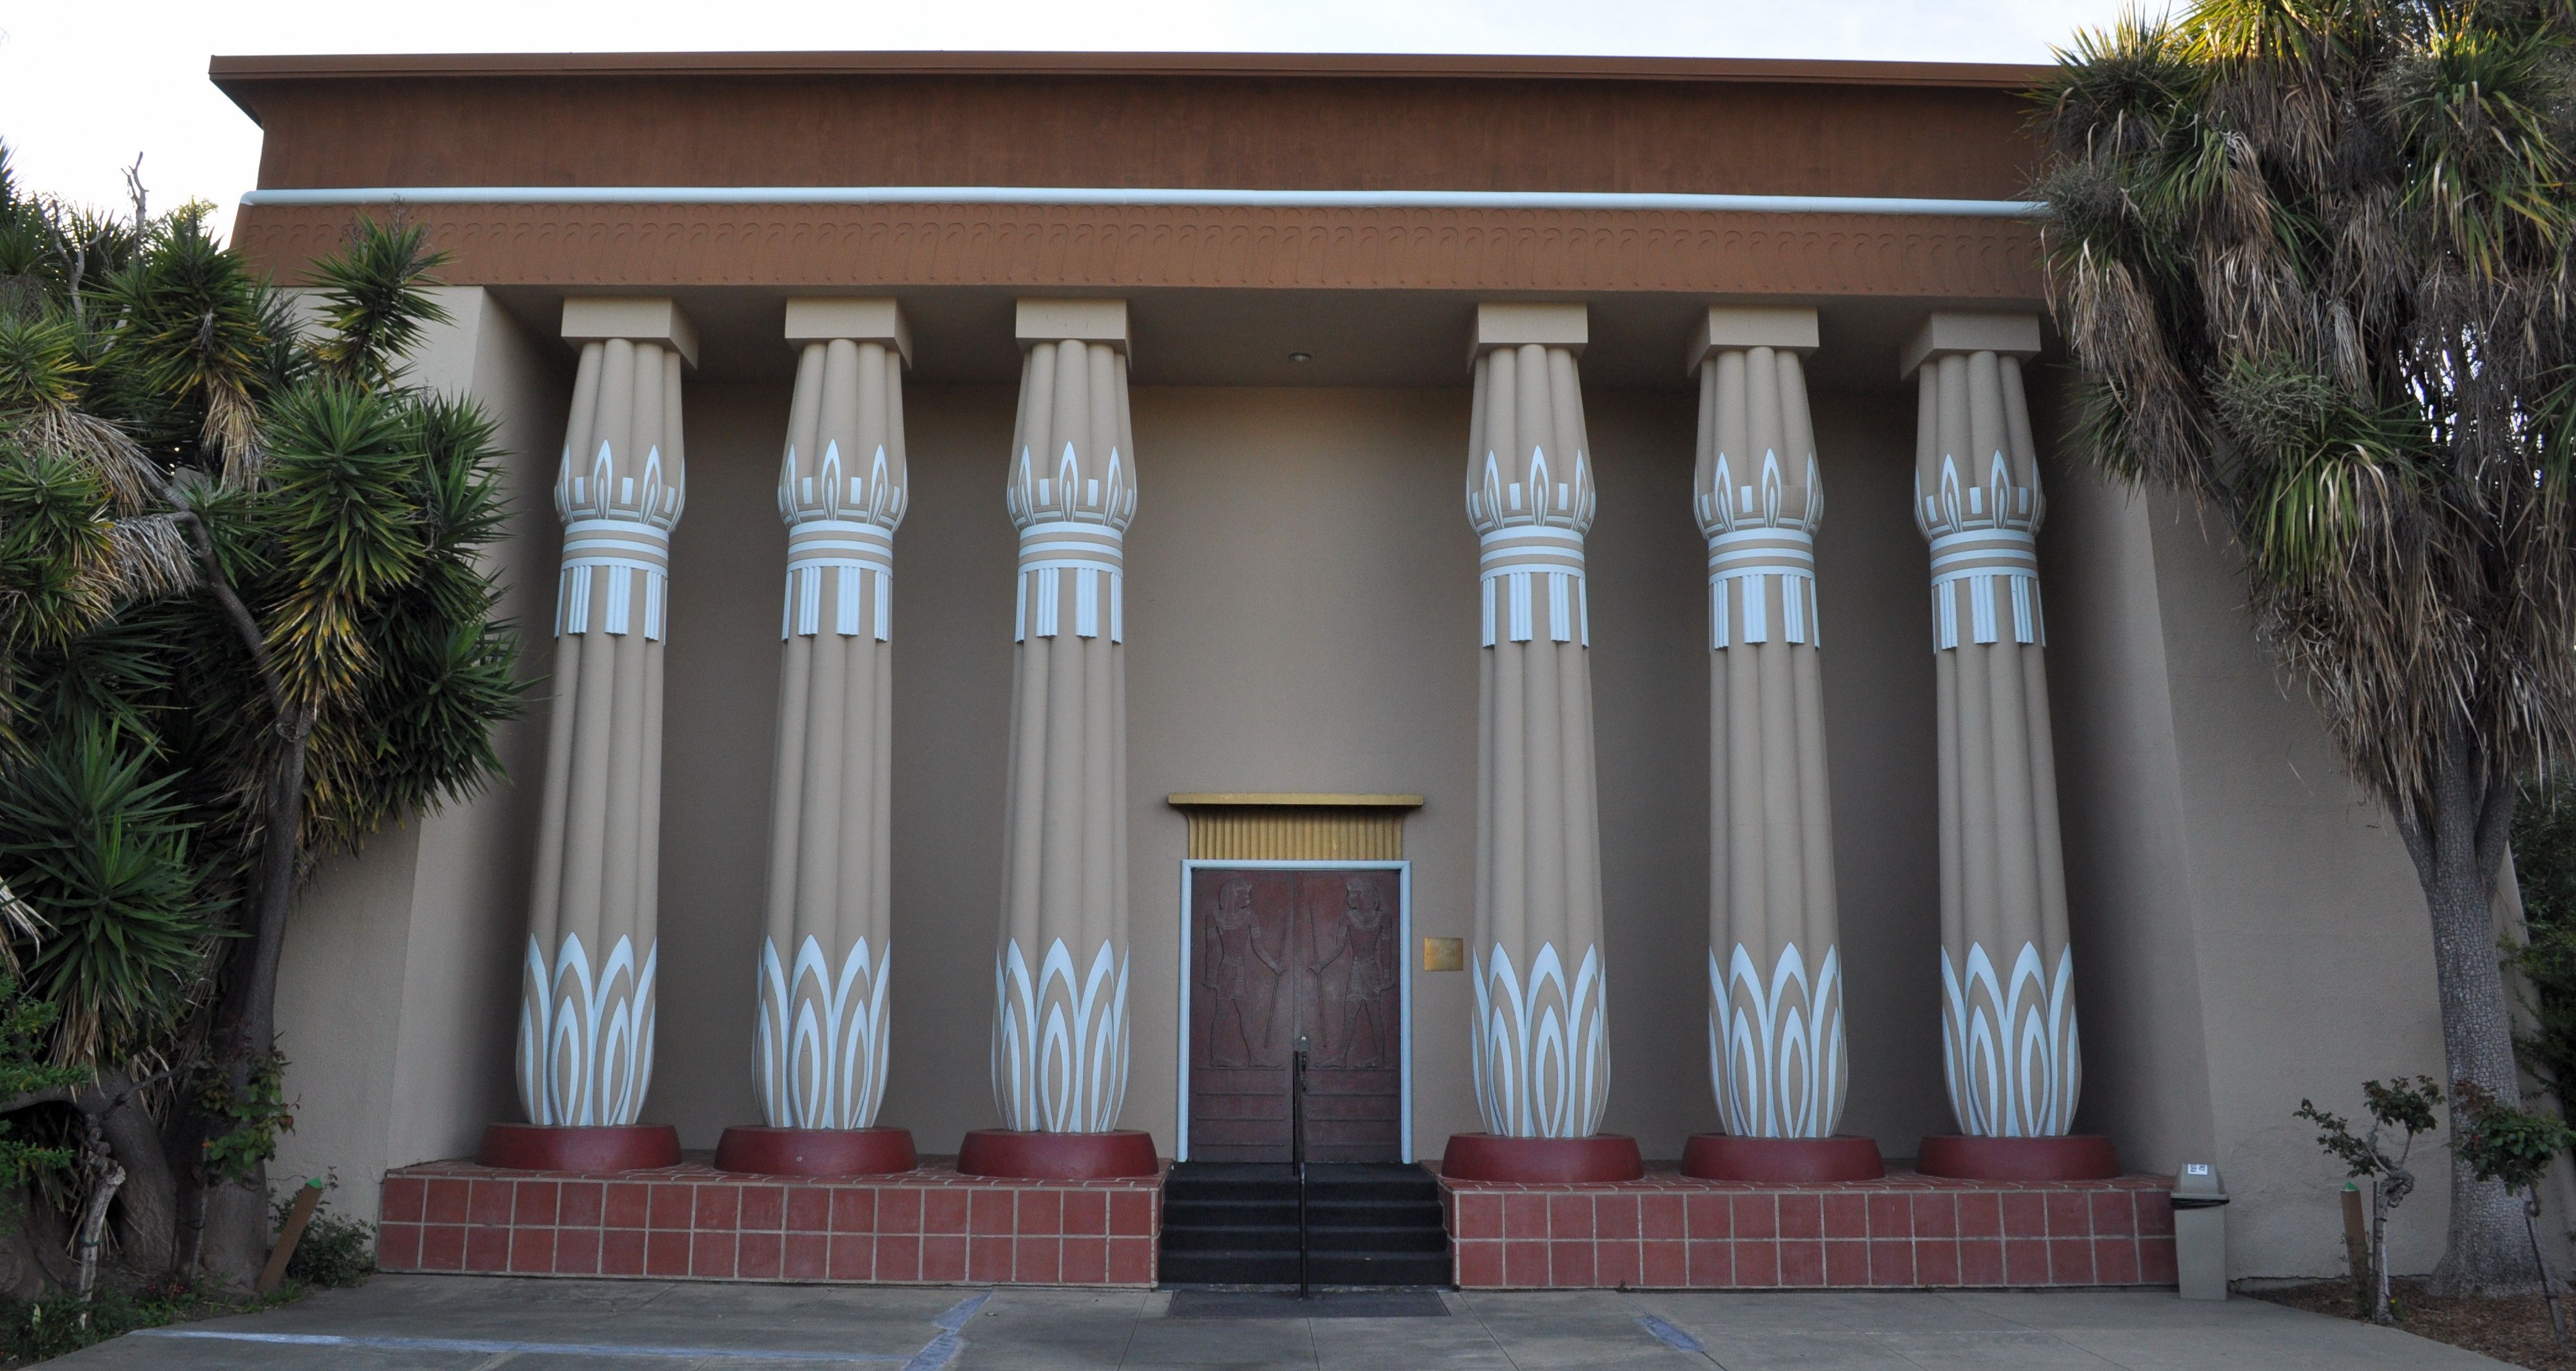 Grand Temple San Jose Rosicrucian Order Amorc Rosicrucian